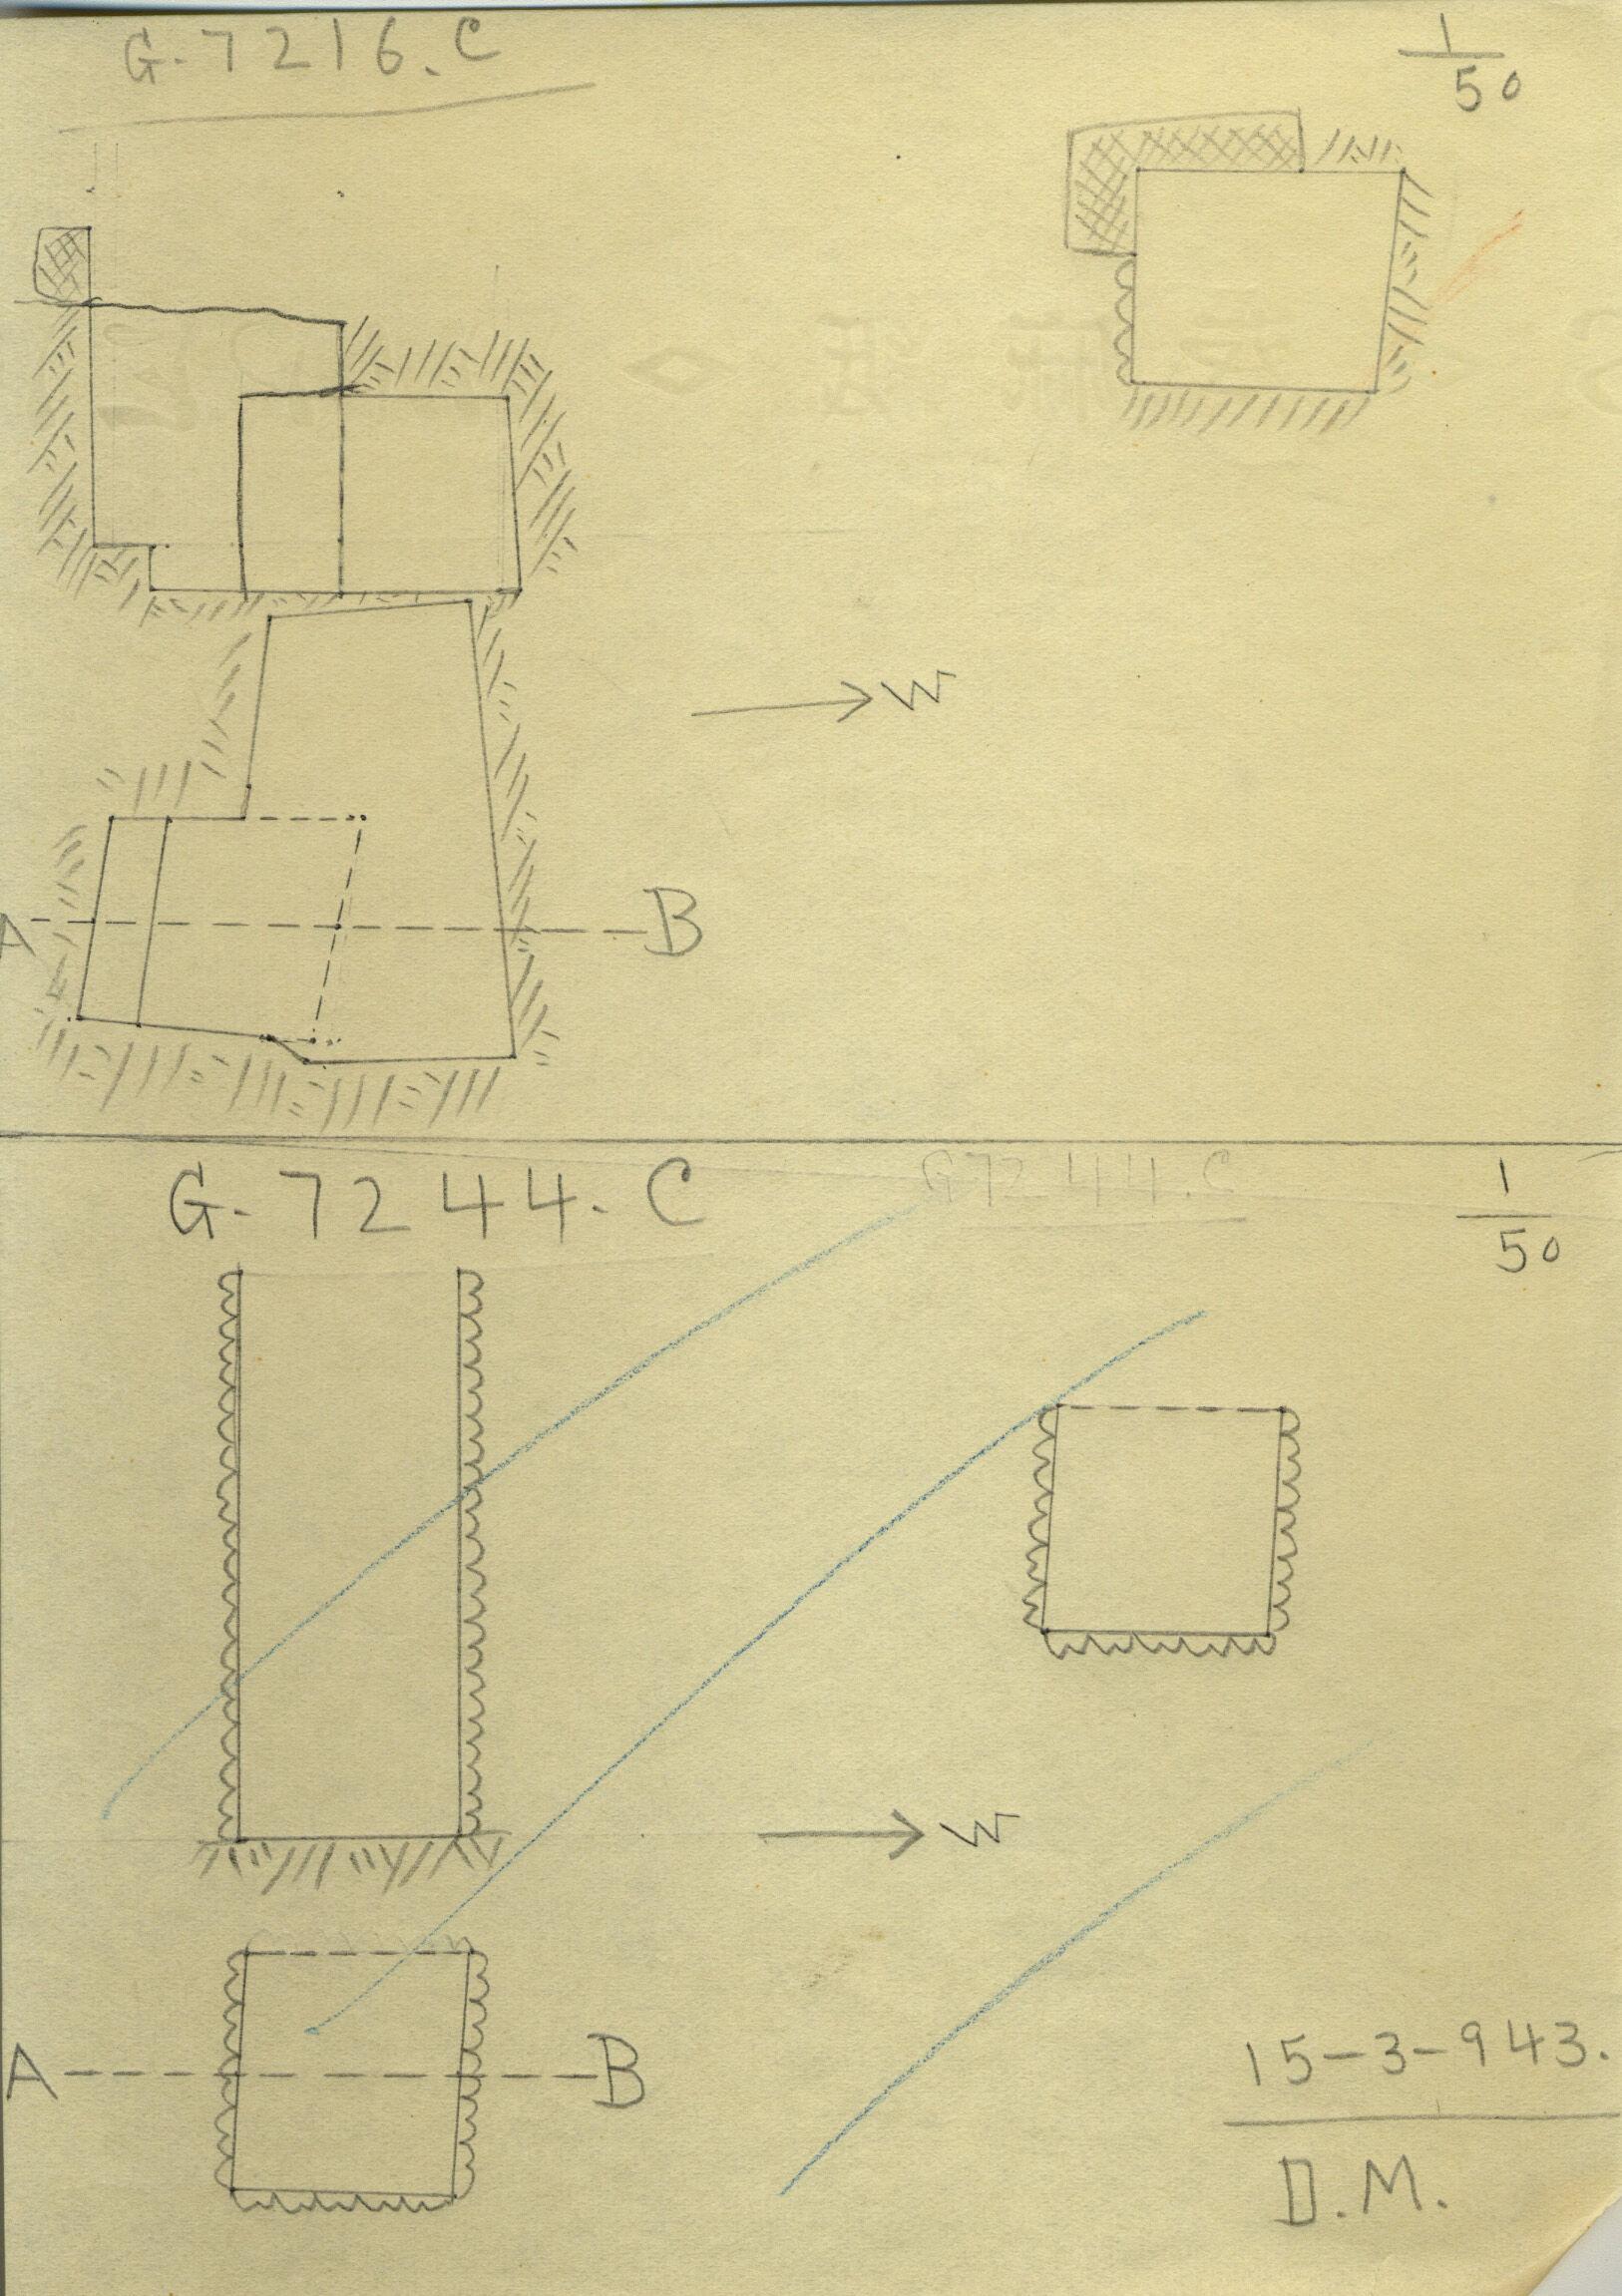 Maps and plans: G 7216, Shaft C & G 7244+7246: G 7244, Shaft C